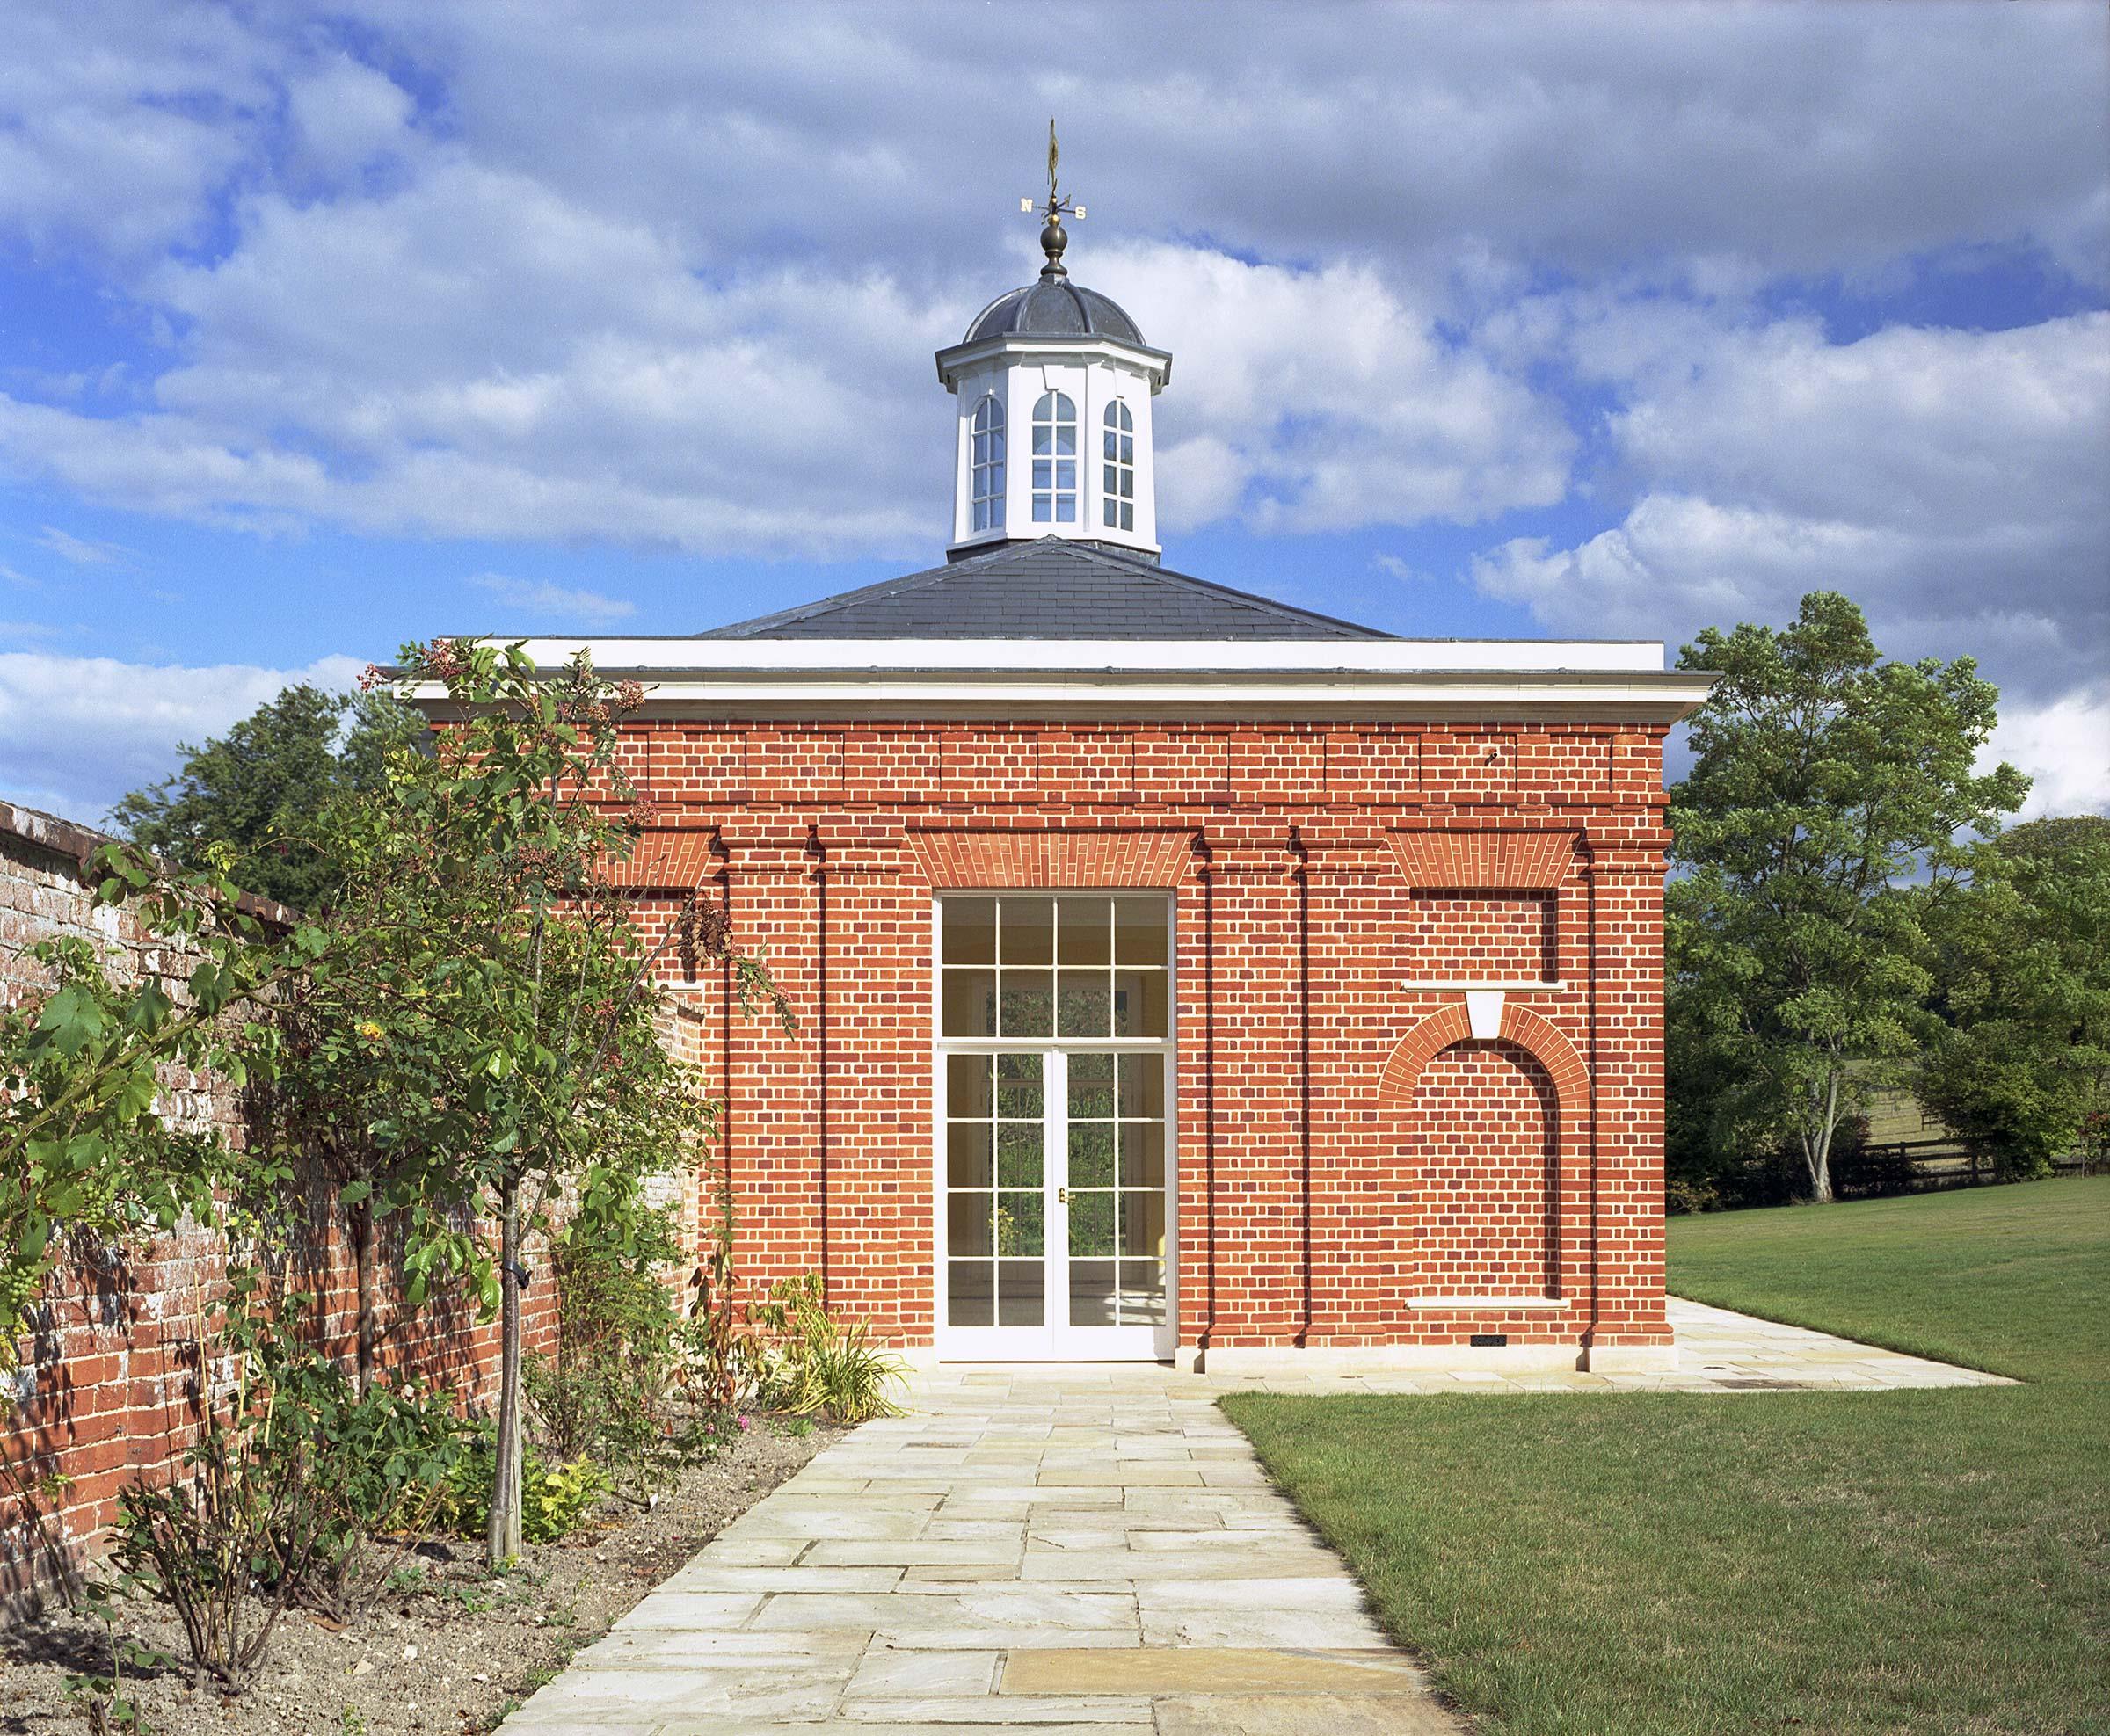 Award winning summerhouse in Hampshire